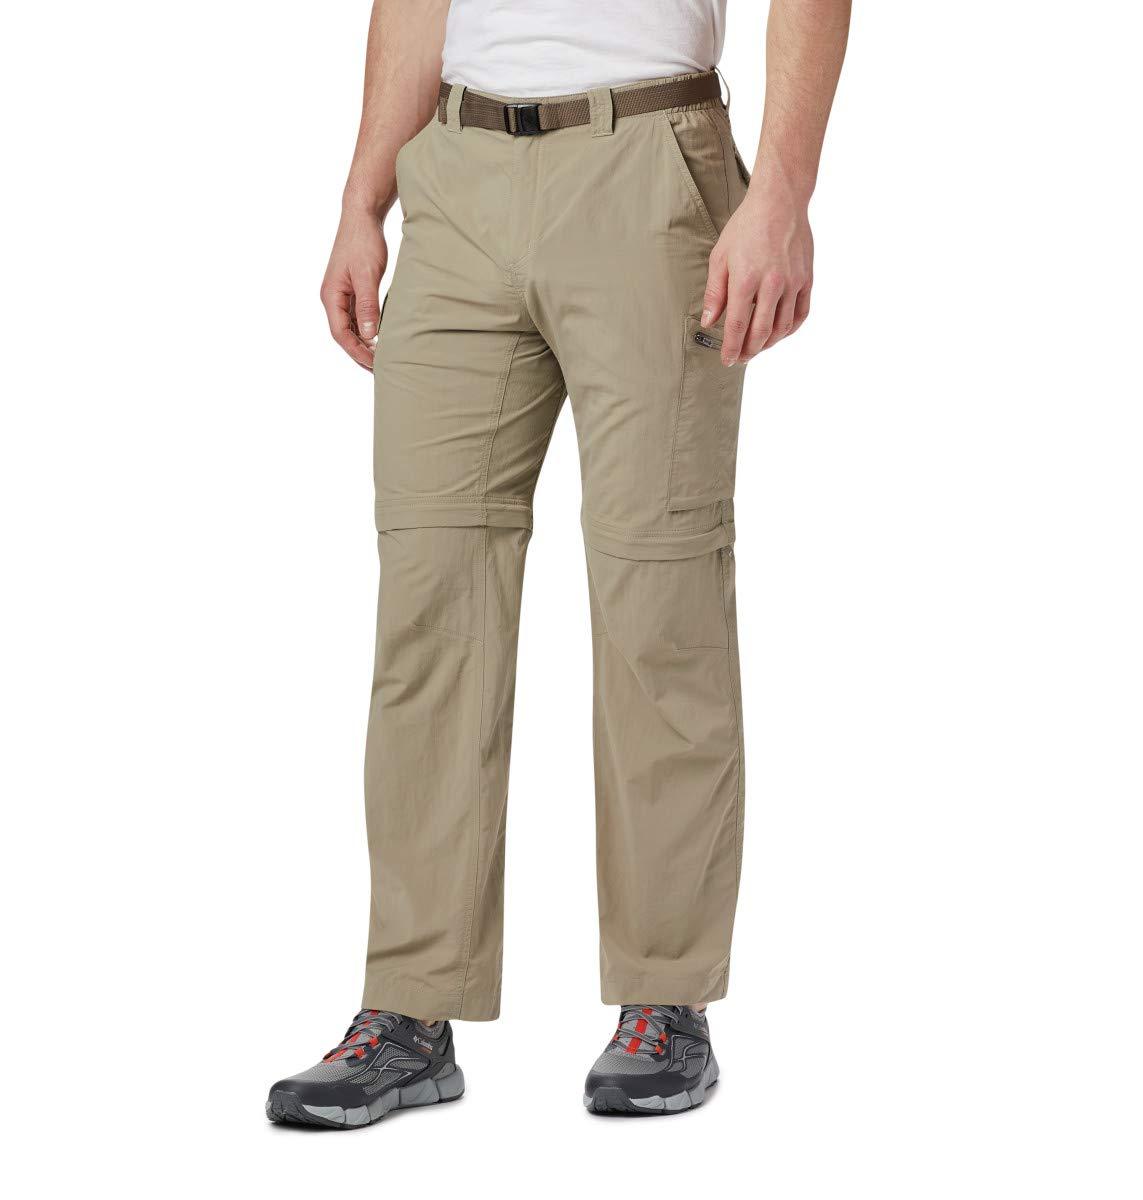 Columbia Silver Ridge Convertible Pant - Pantalon - Droite - Homme